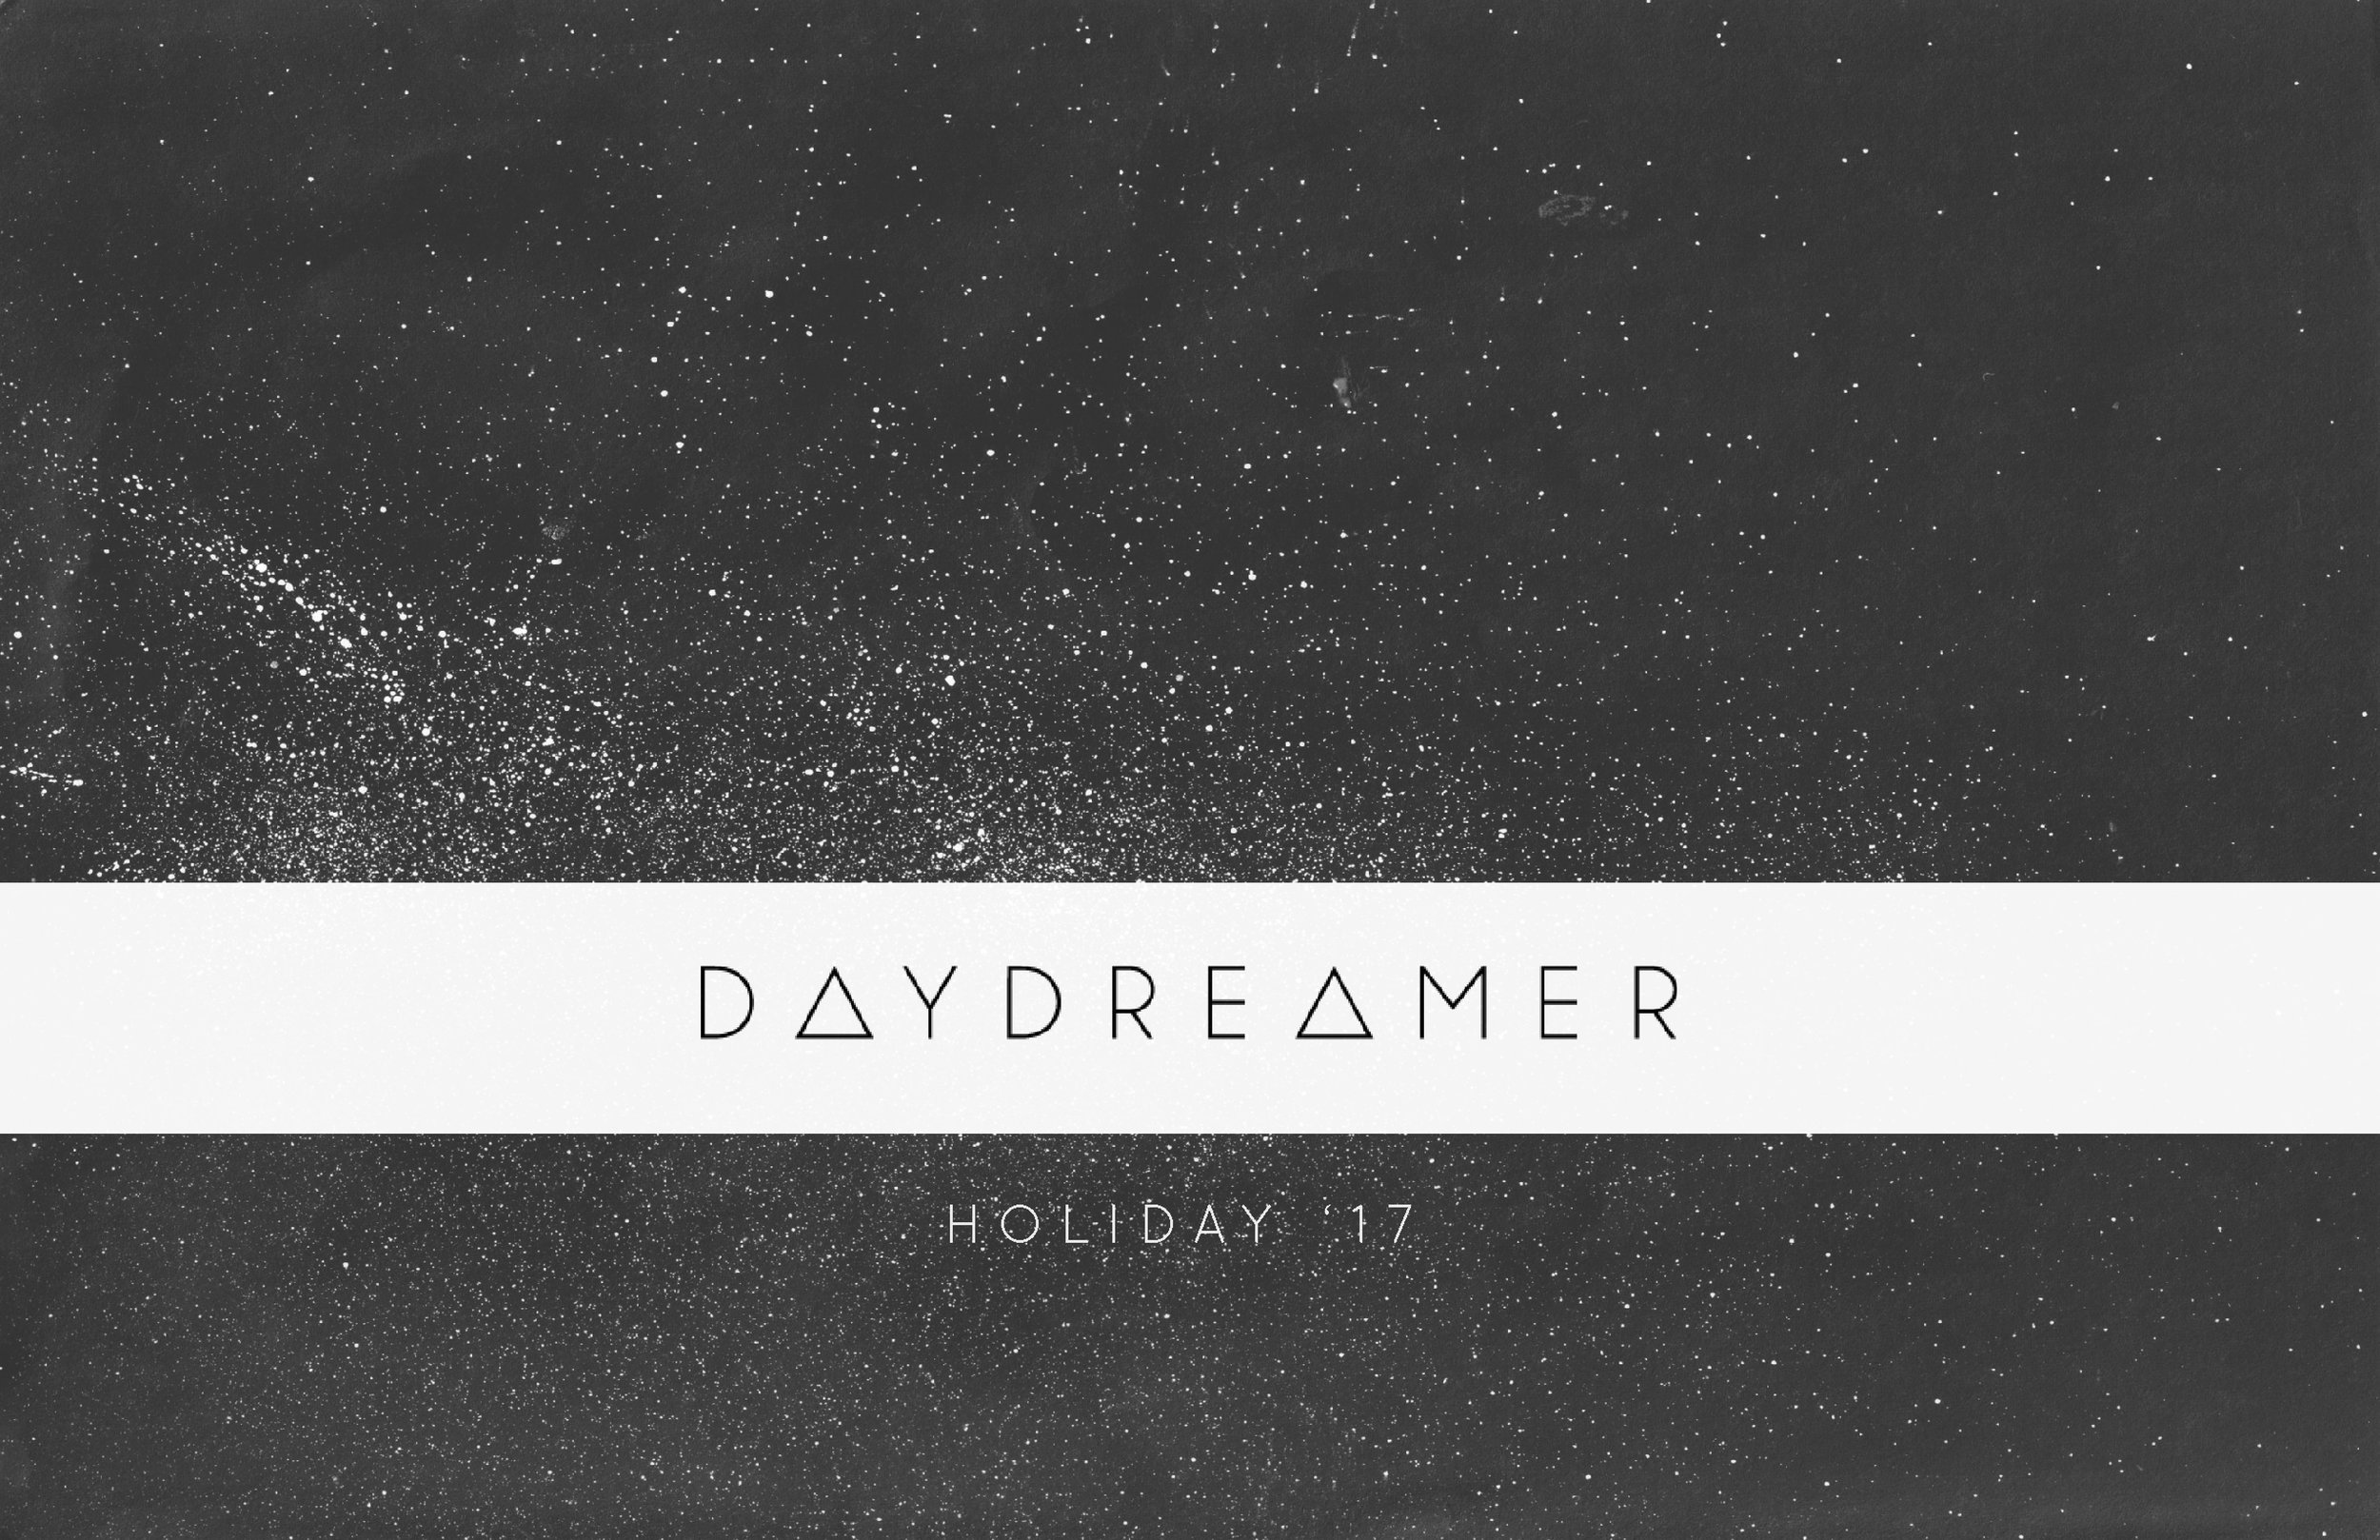 DAYDREAMER-01.jpg